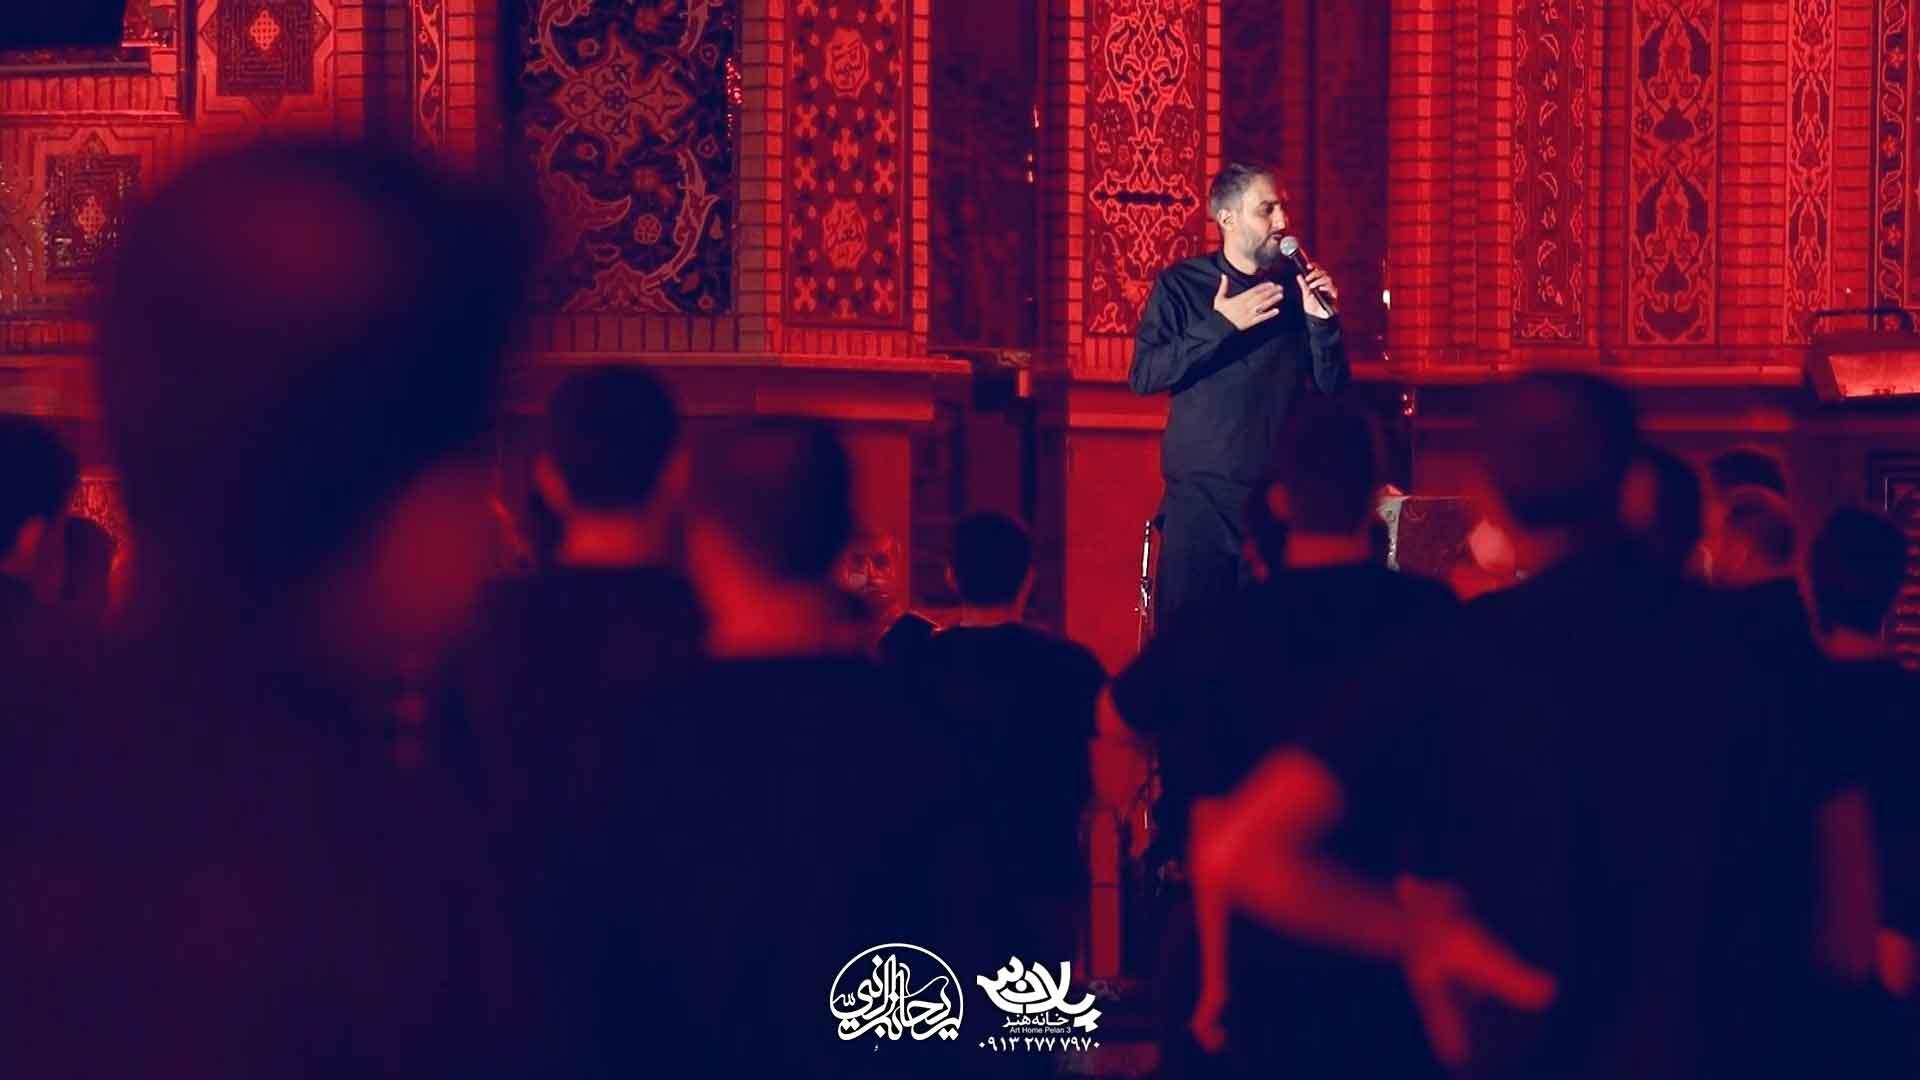 اصلیتم کربلاییه محمدحسین پویانفر